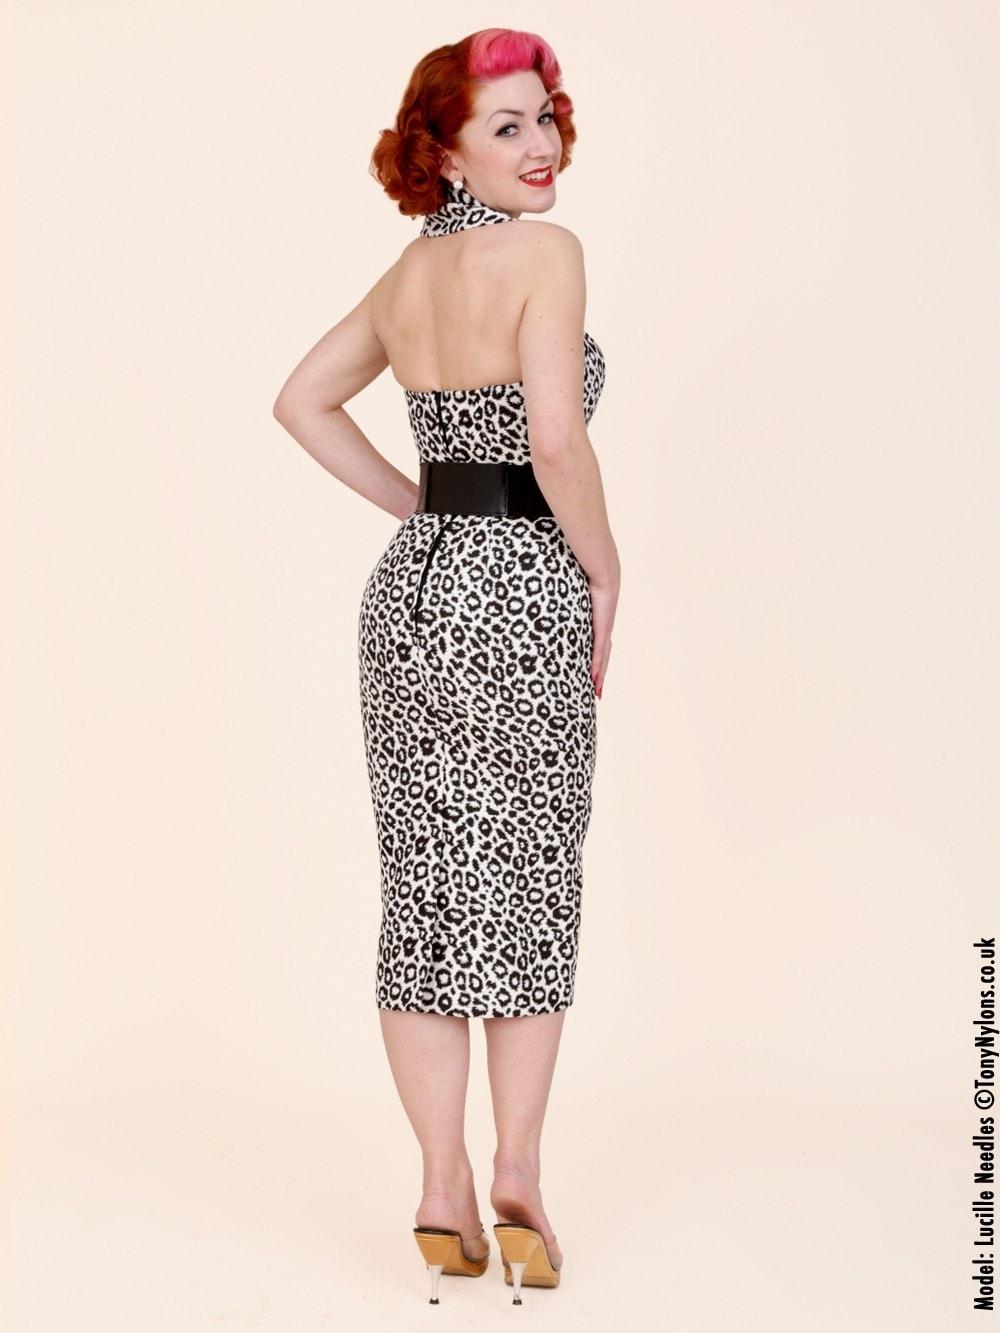 967b46d73b57 1950s Halterneck Pencil White Leopard Dress from Vivien of Holloway